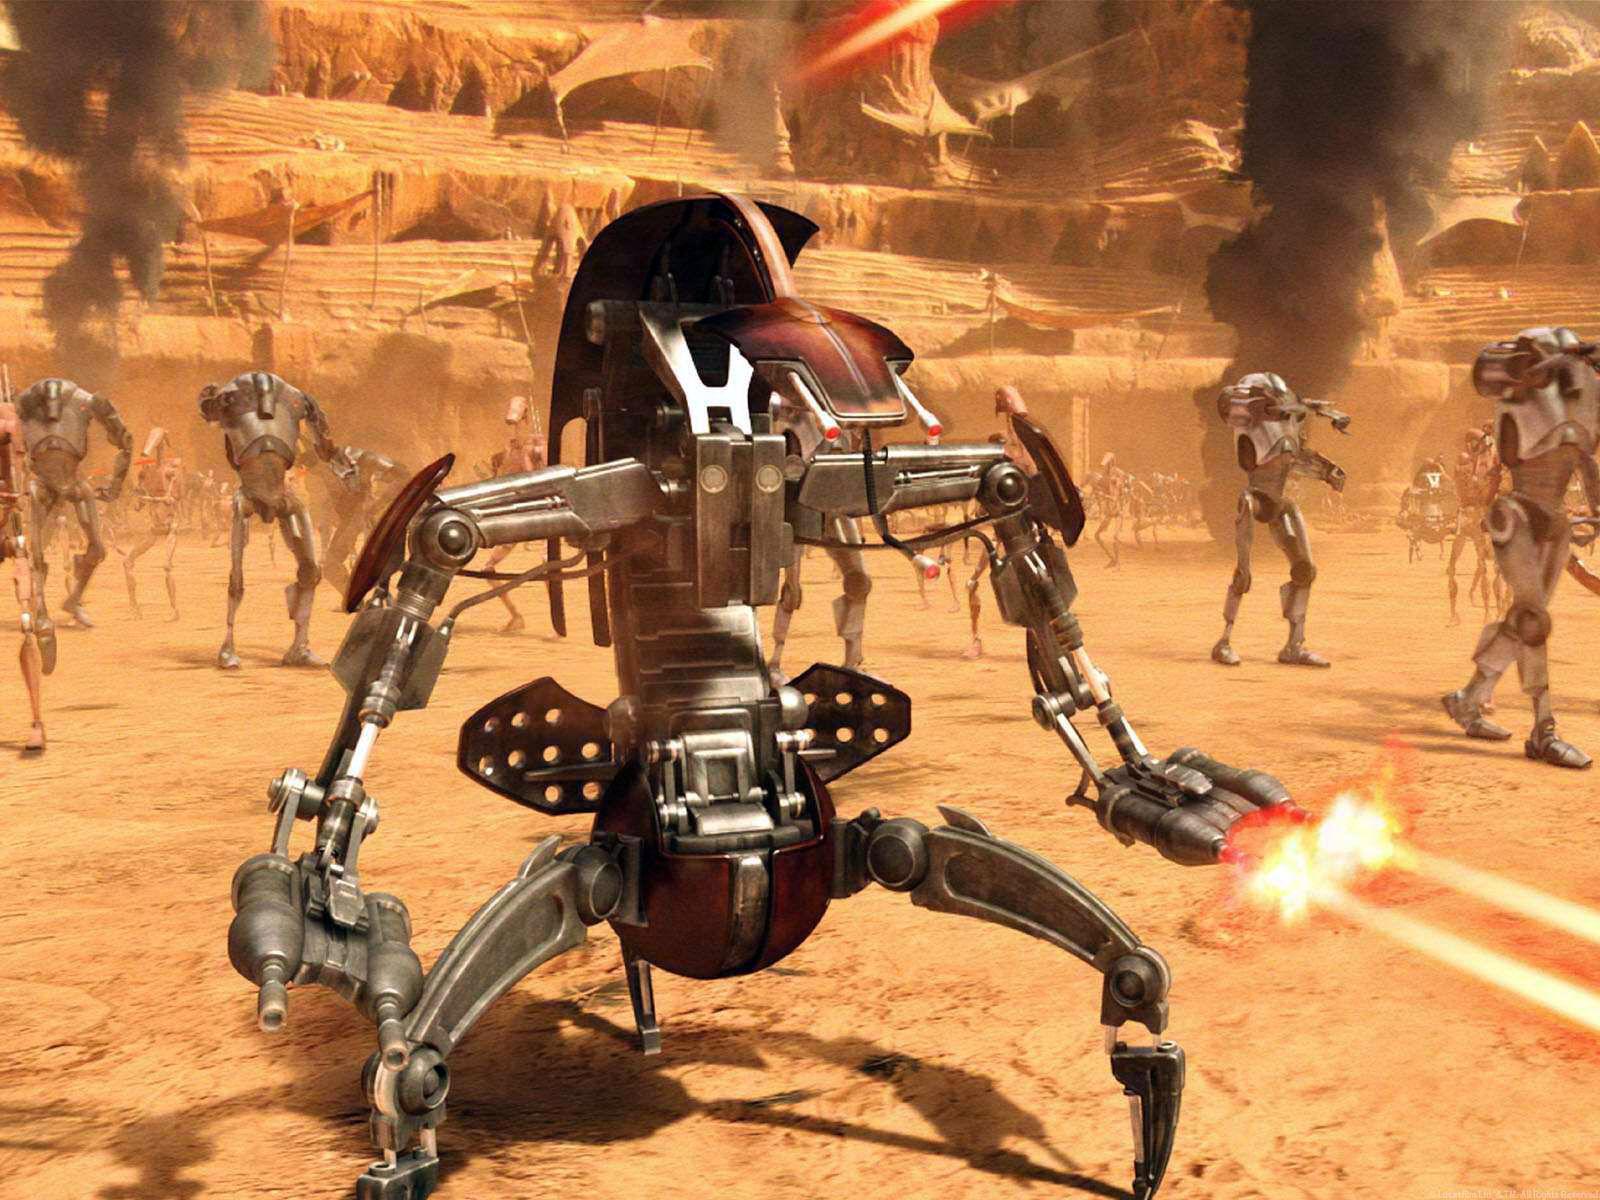 Resultado de imagem para destroyer droid star wars